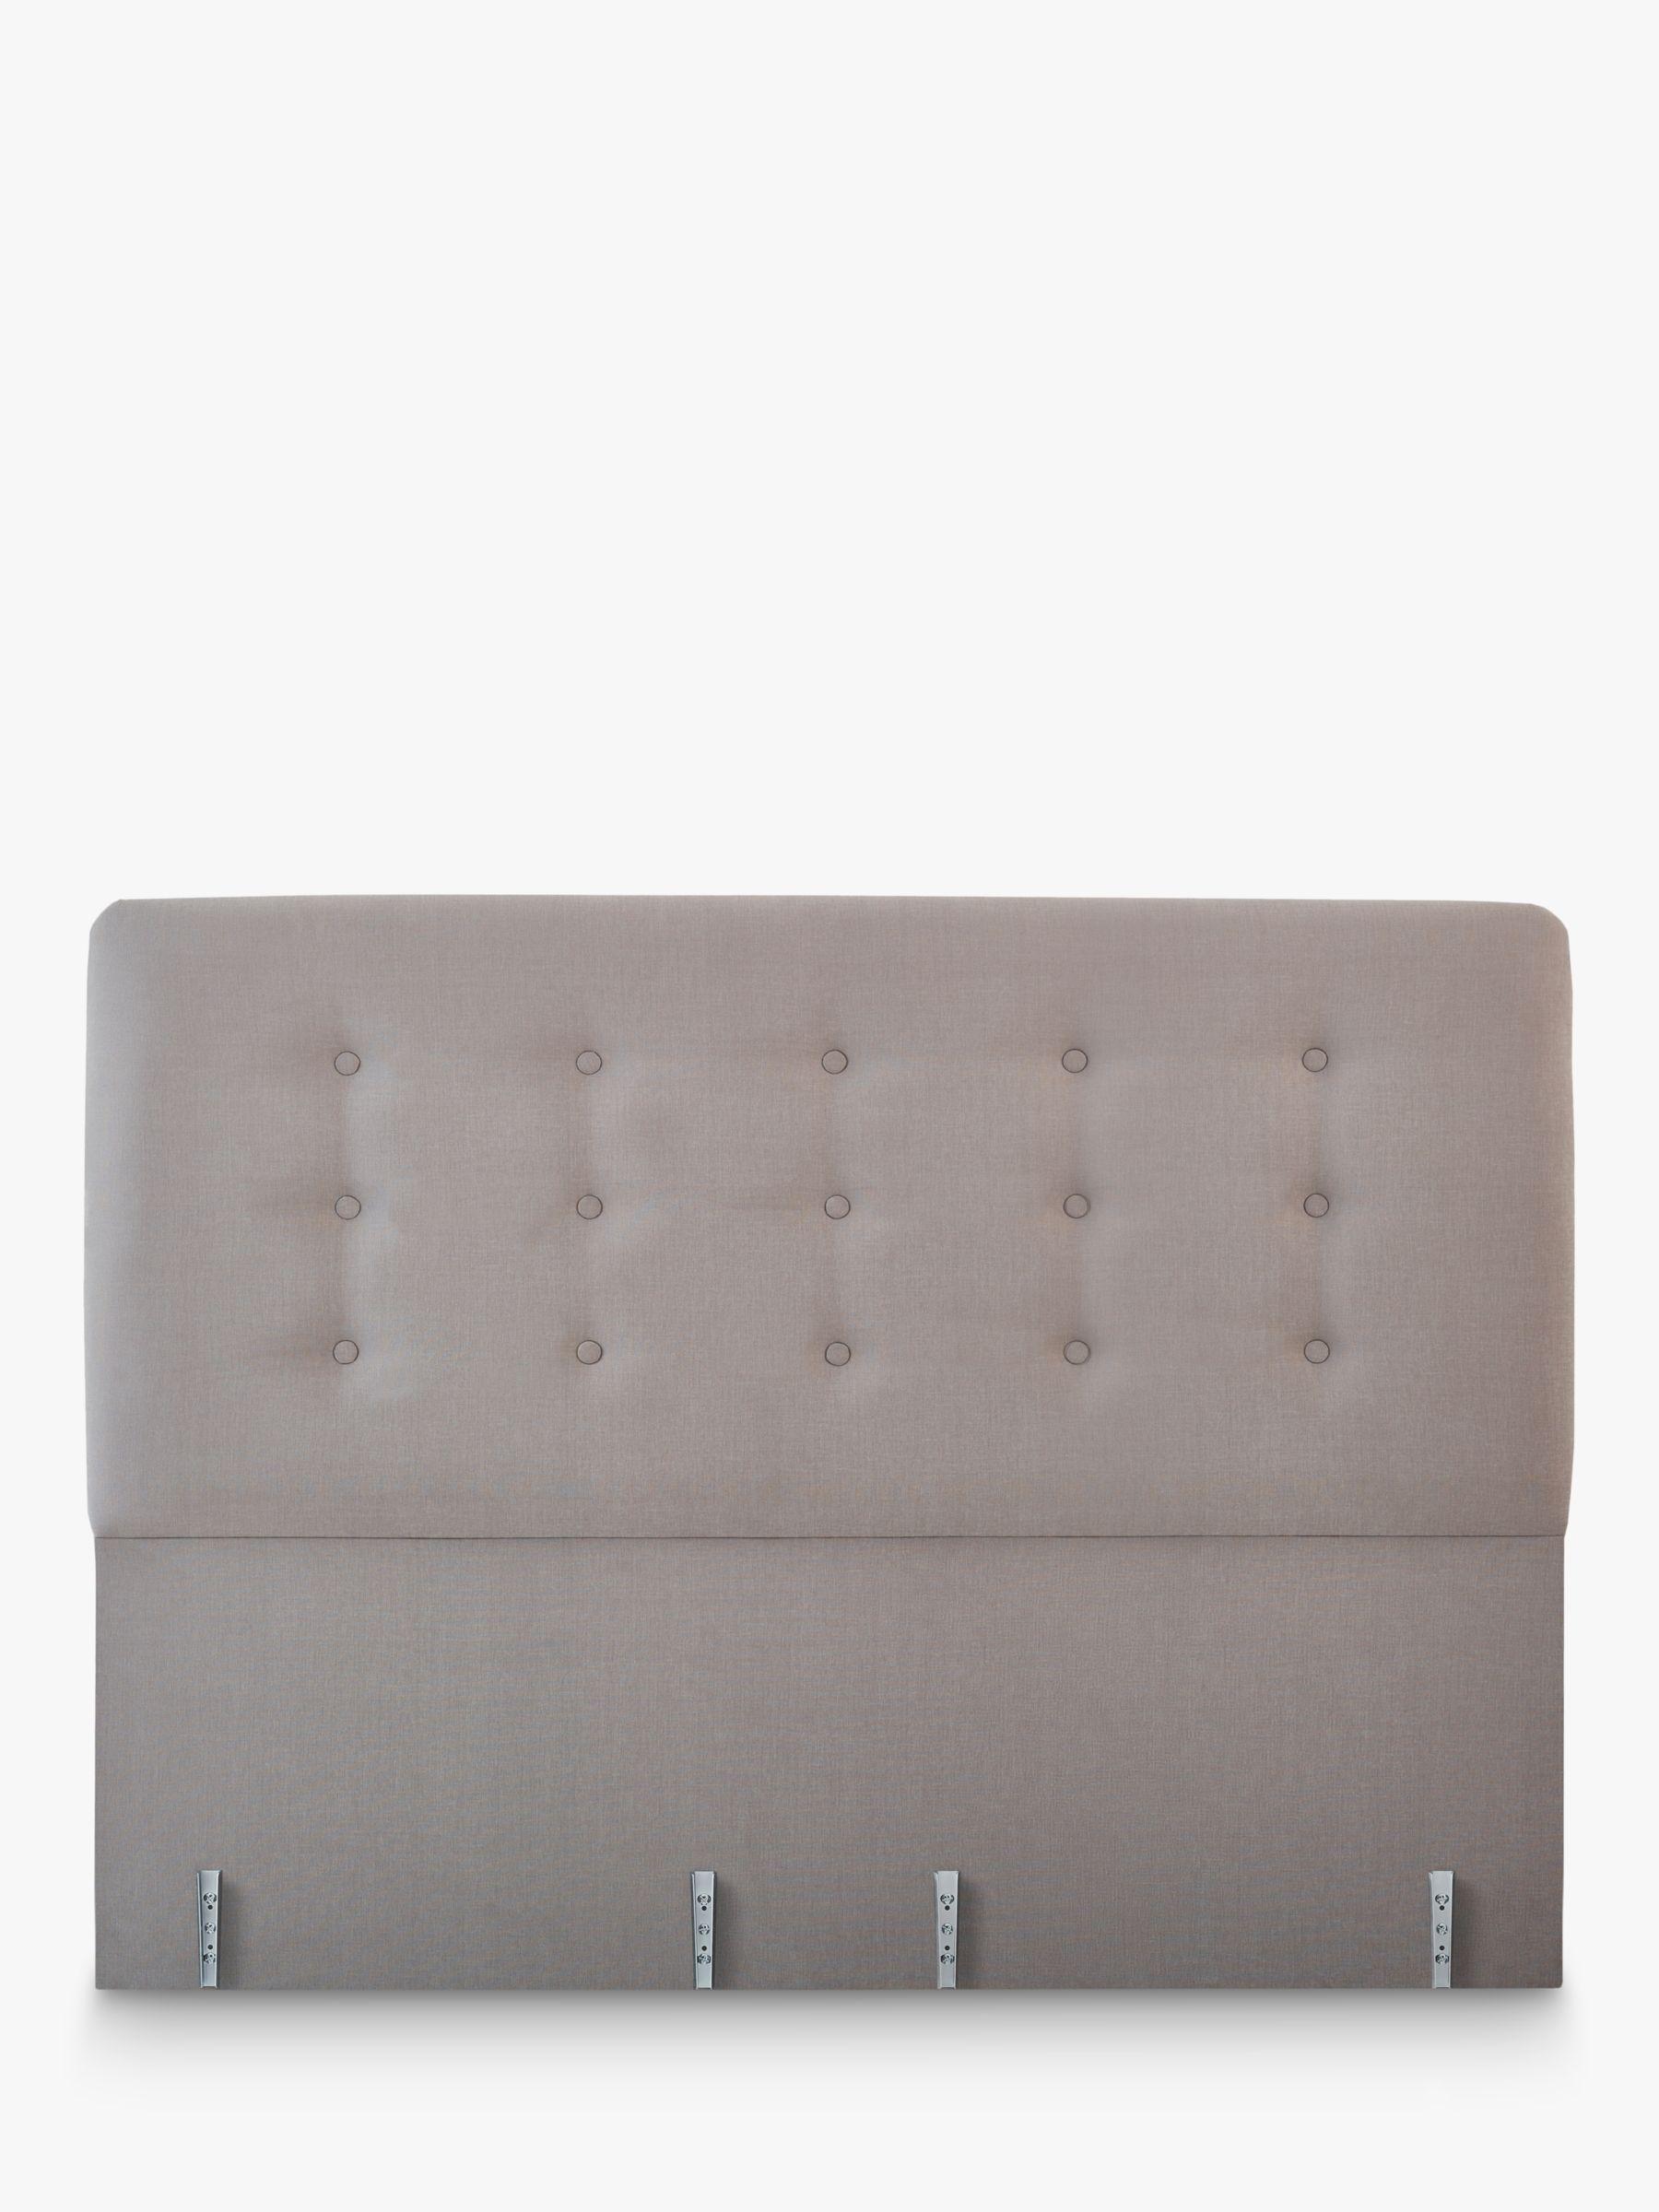 Vispring Clio Full Depth Upholstered Headboard, Super King Size, FSC-Certified (Chipboard)